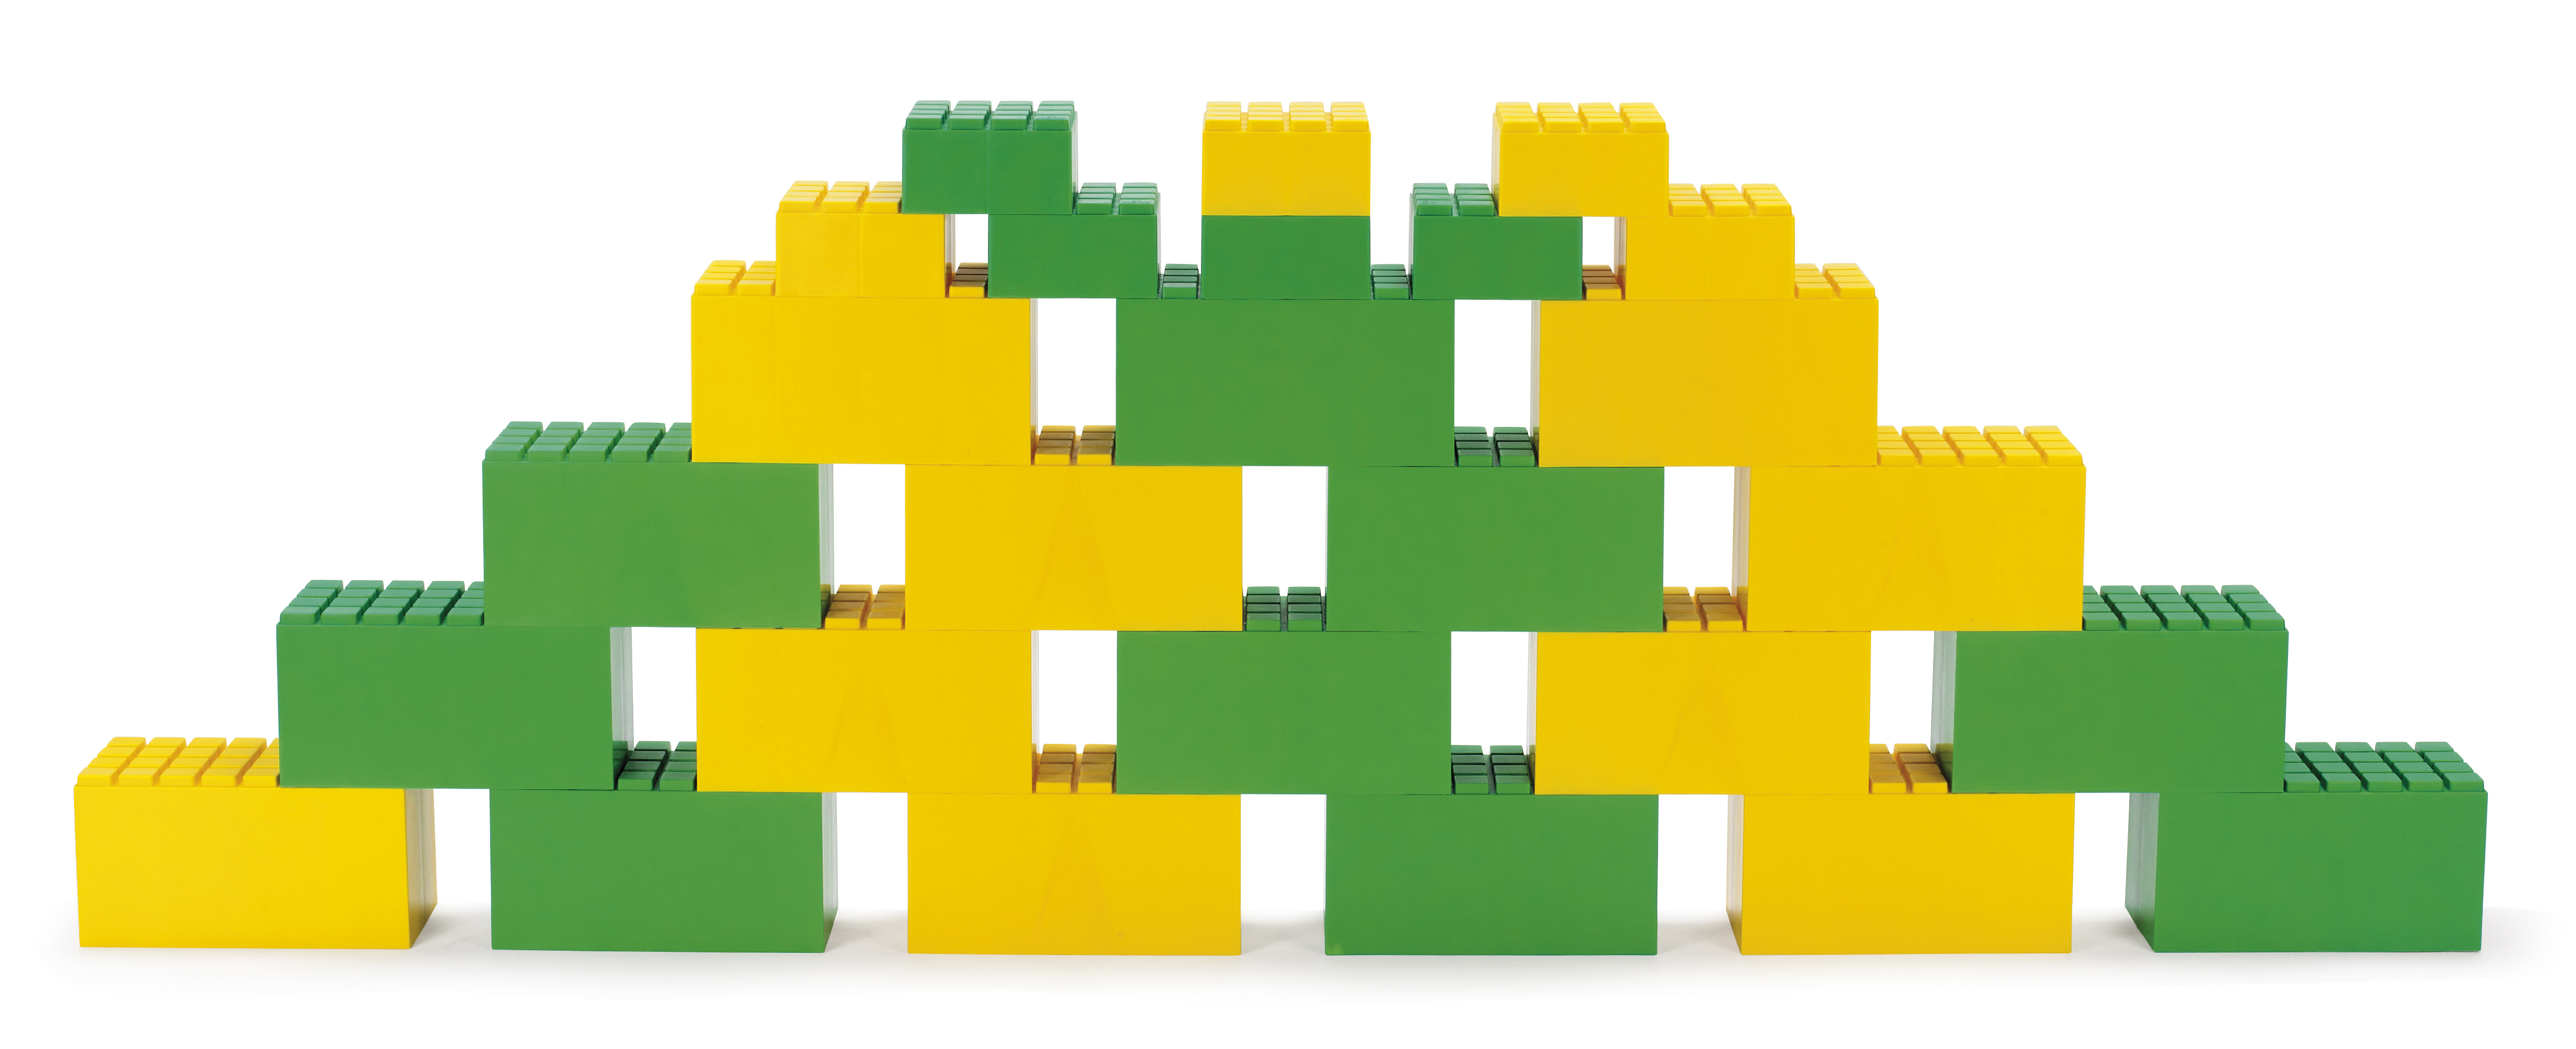 Dantoy – Dantoy byggeklodser 26 stk - grøn/gul, 1 stk. på lager på pixizoo